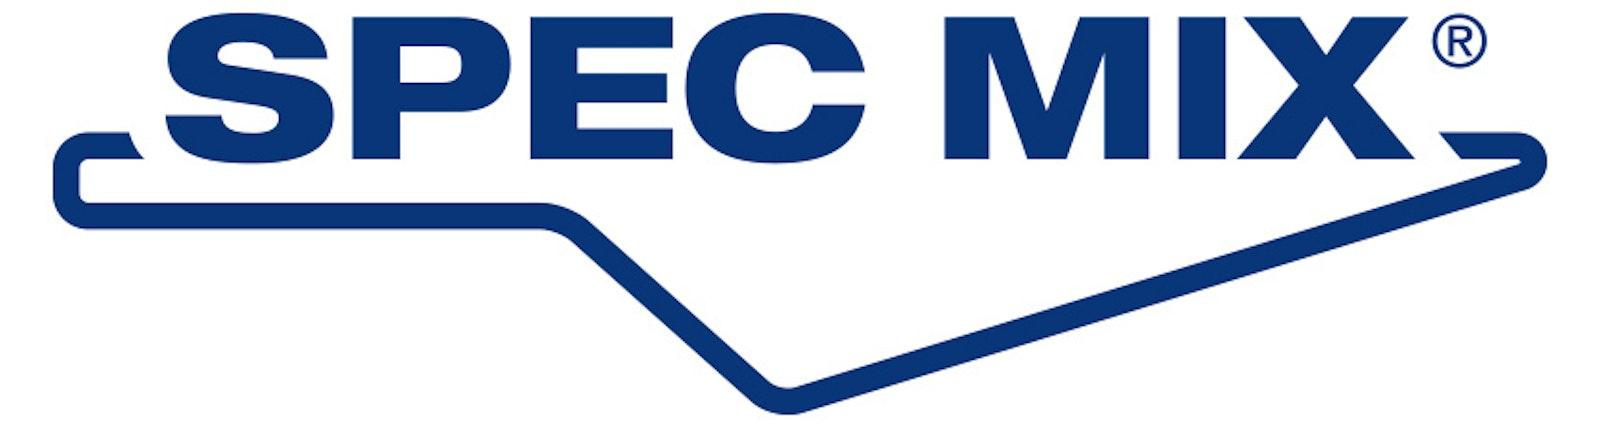 Specmix logo